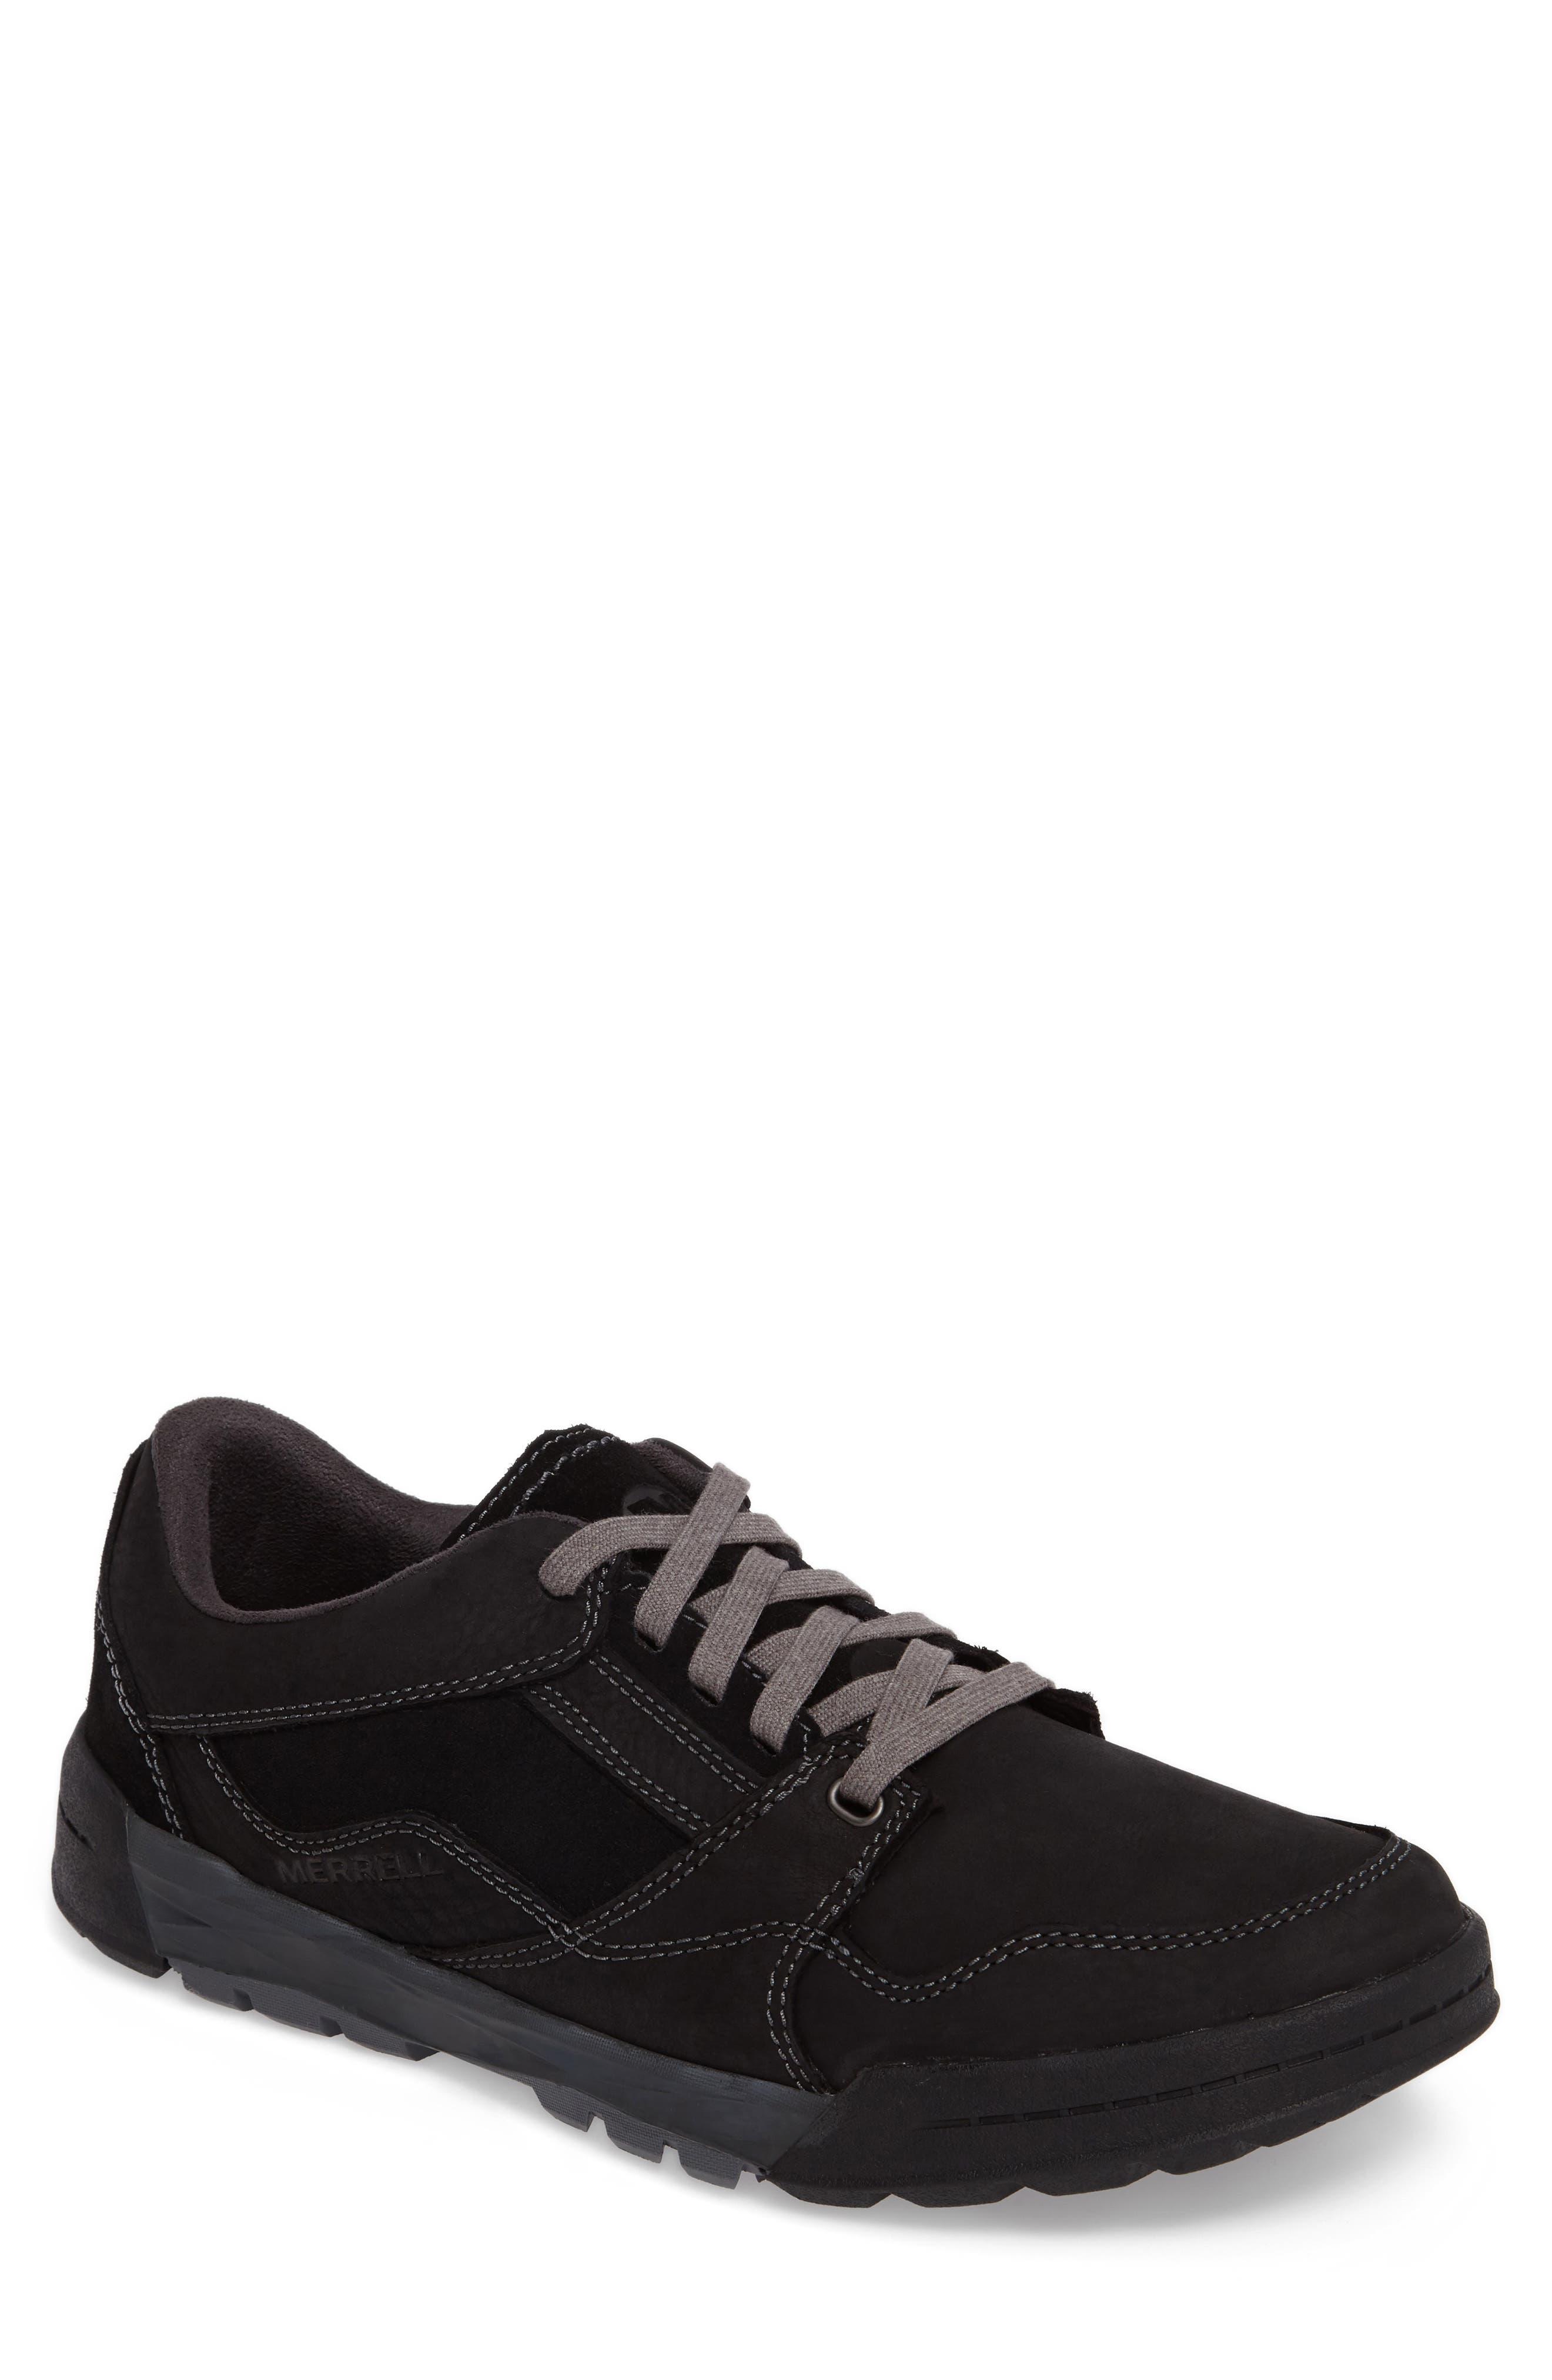 Alternate Image 1 Selected - Merrell Berner Sneaker (Men)